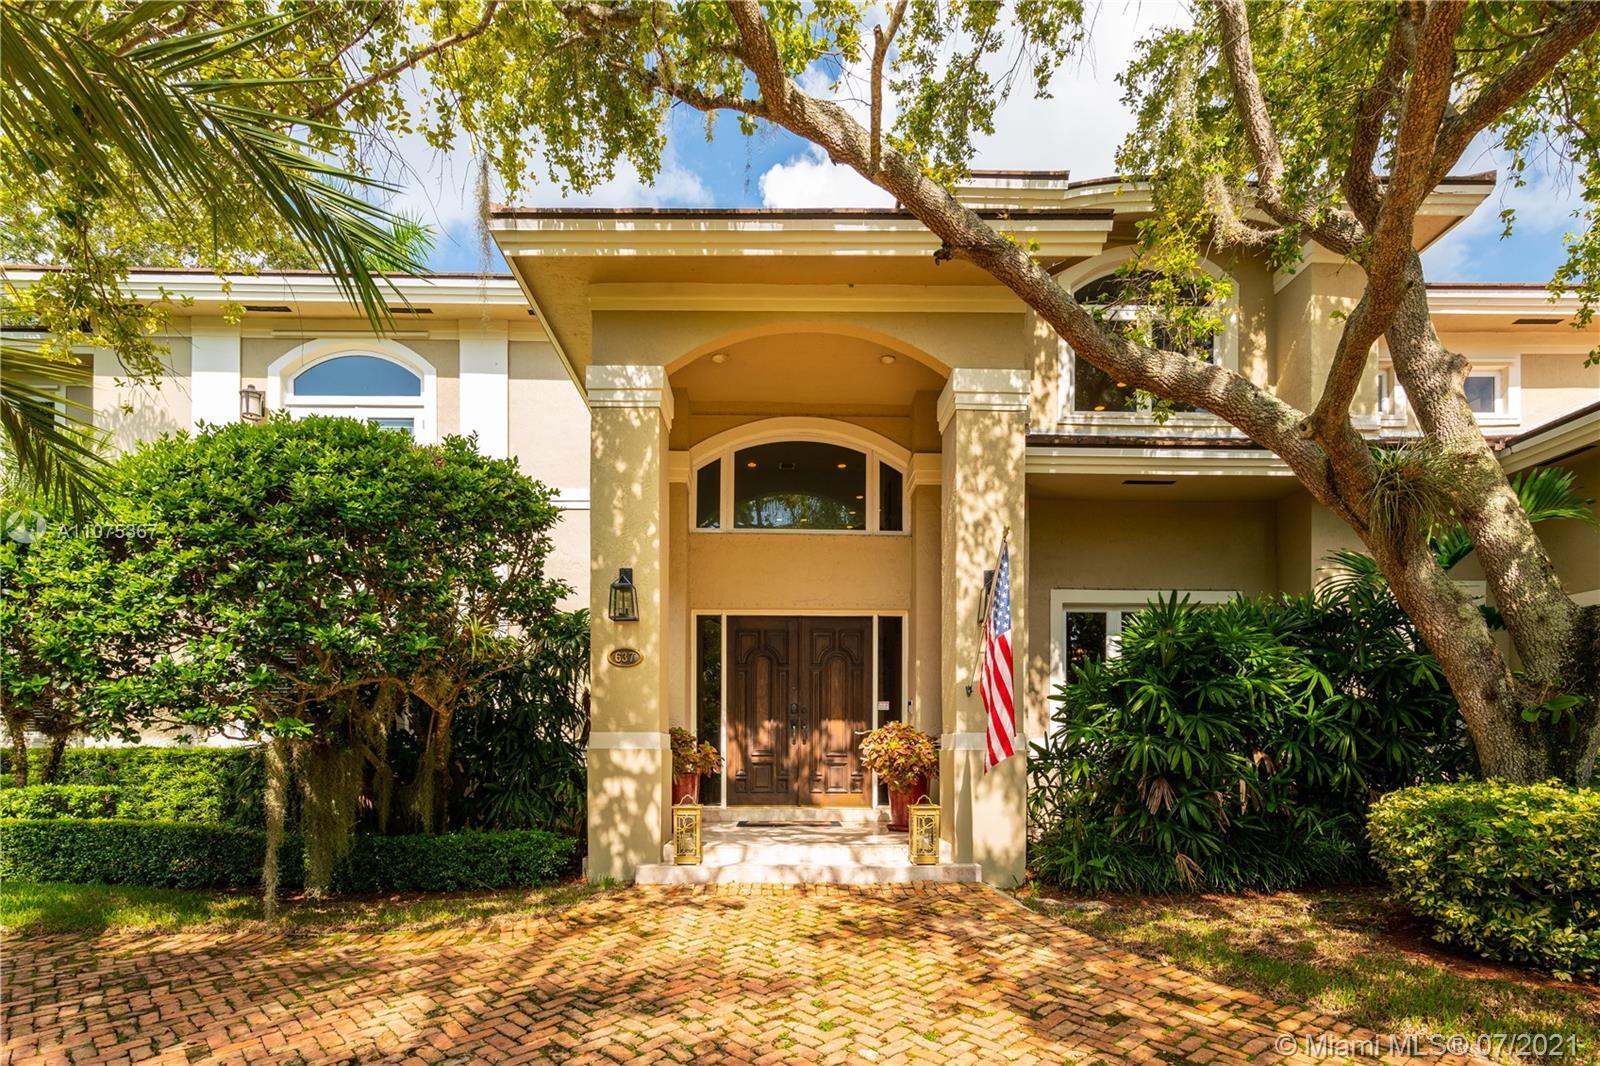 Hammock Oaks - 637 Destacada Ave, Coral Gables, FL 33156